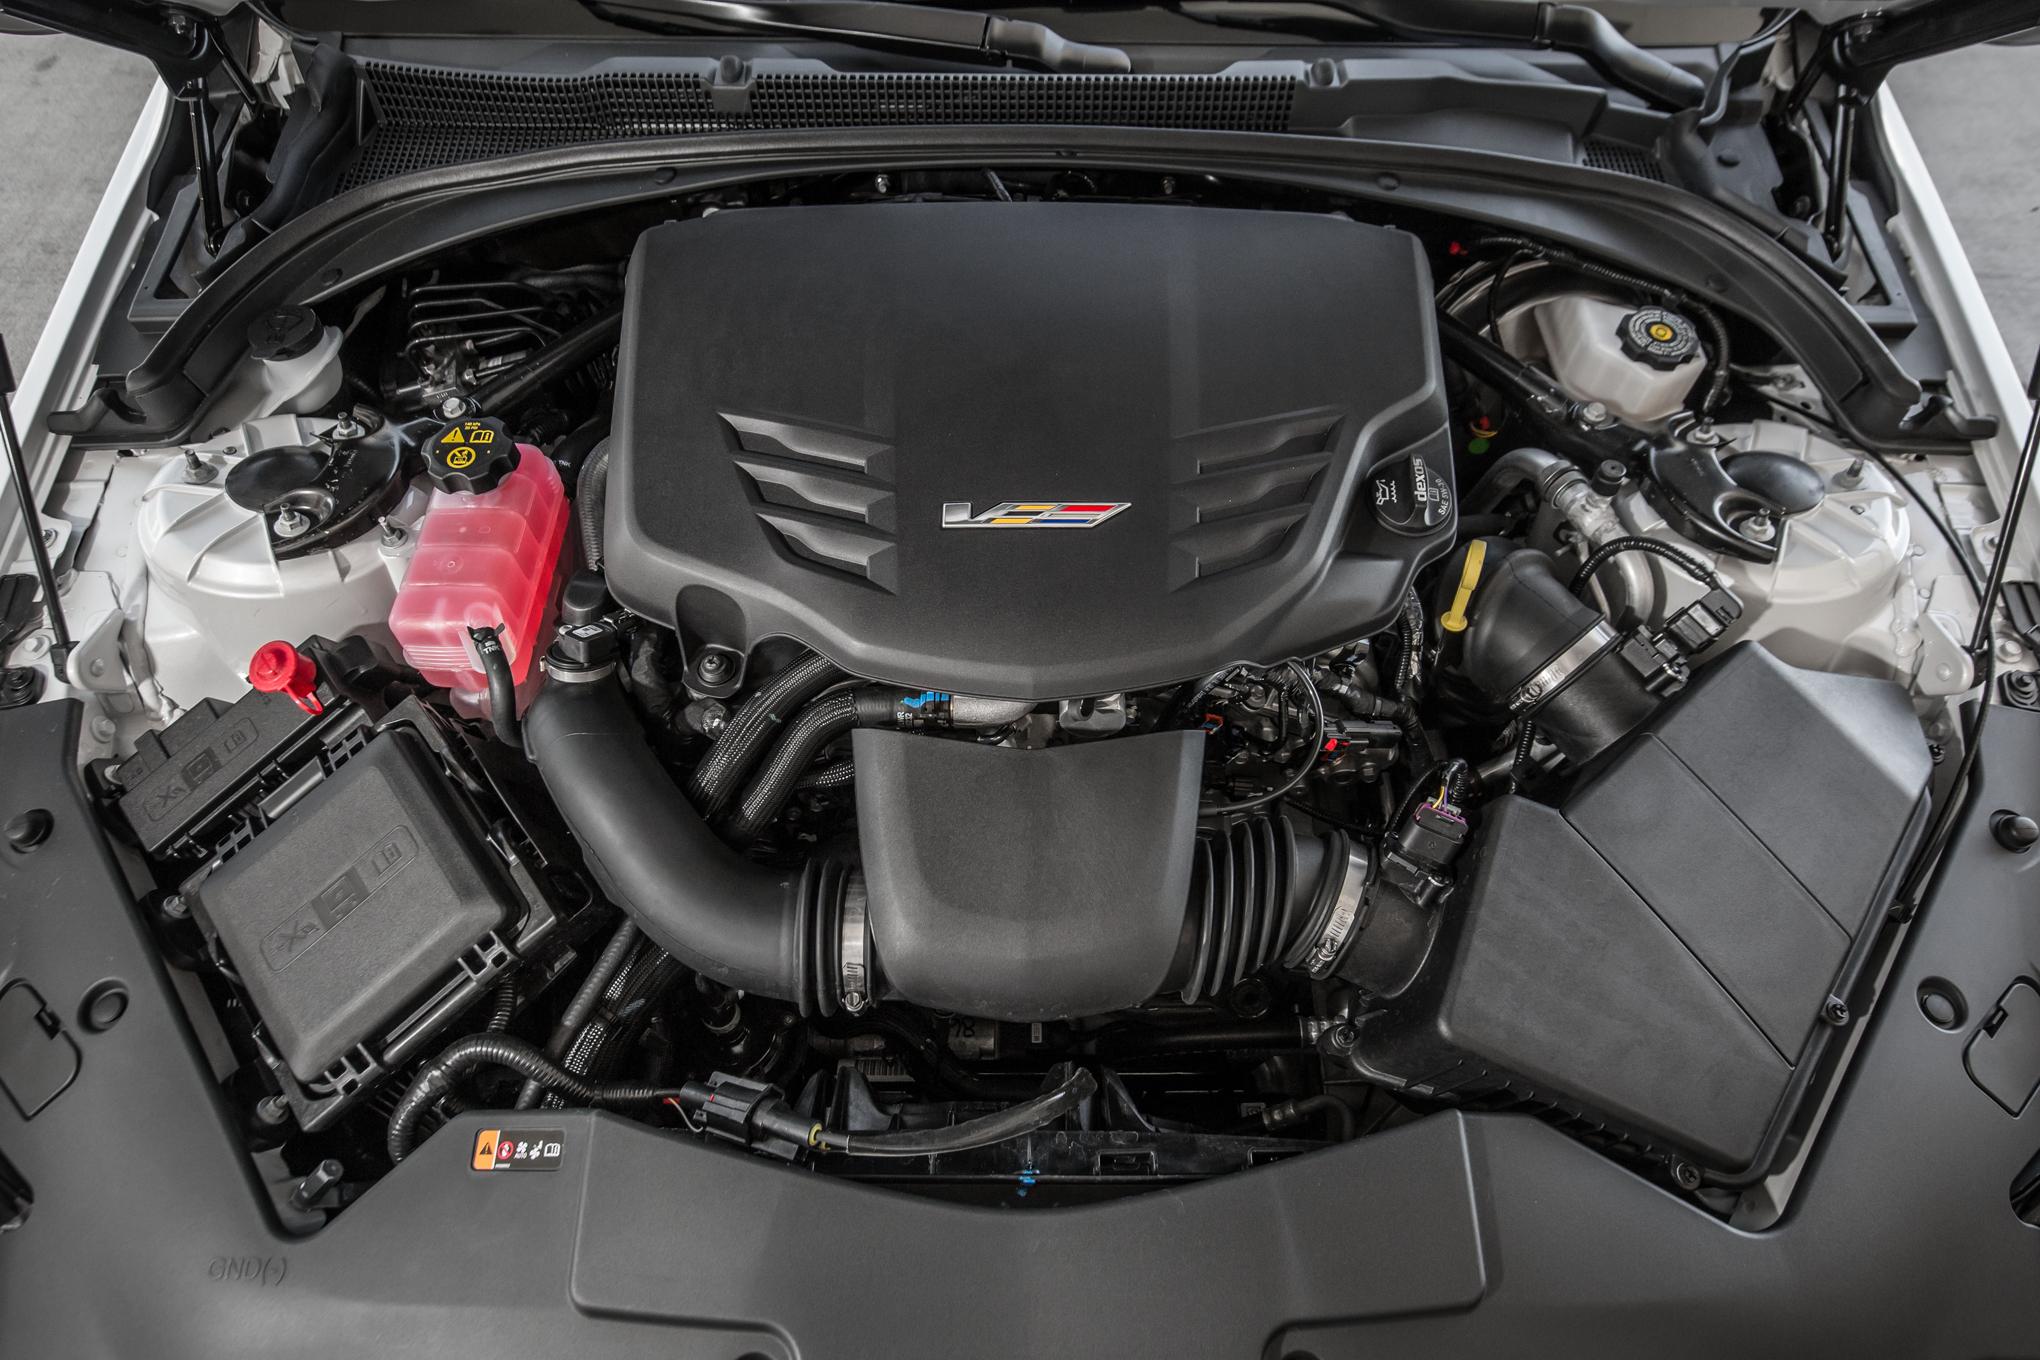 Cadillac CTS Engine